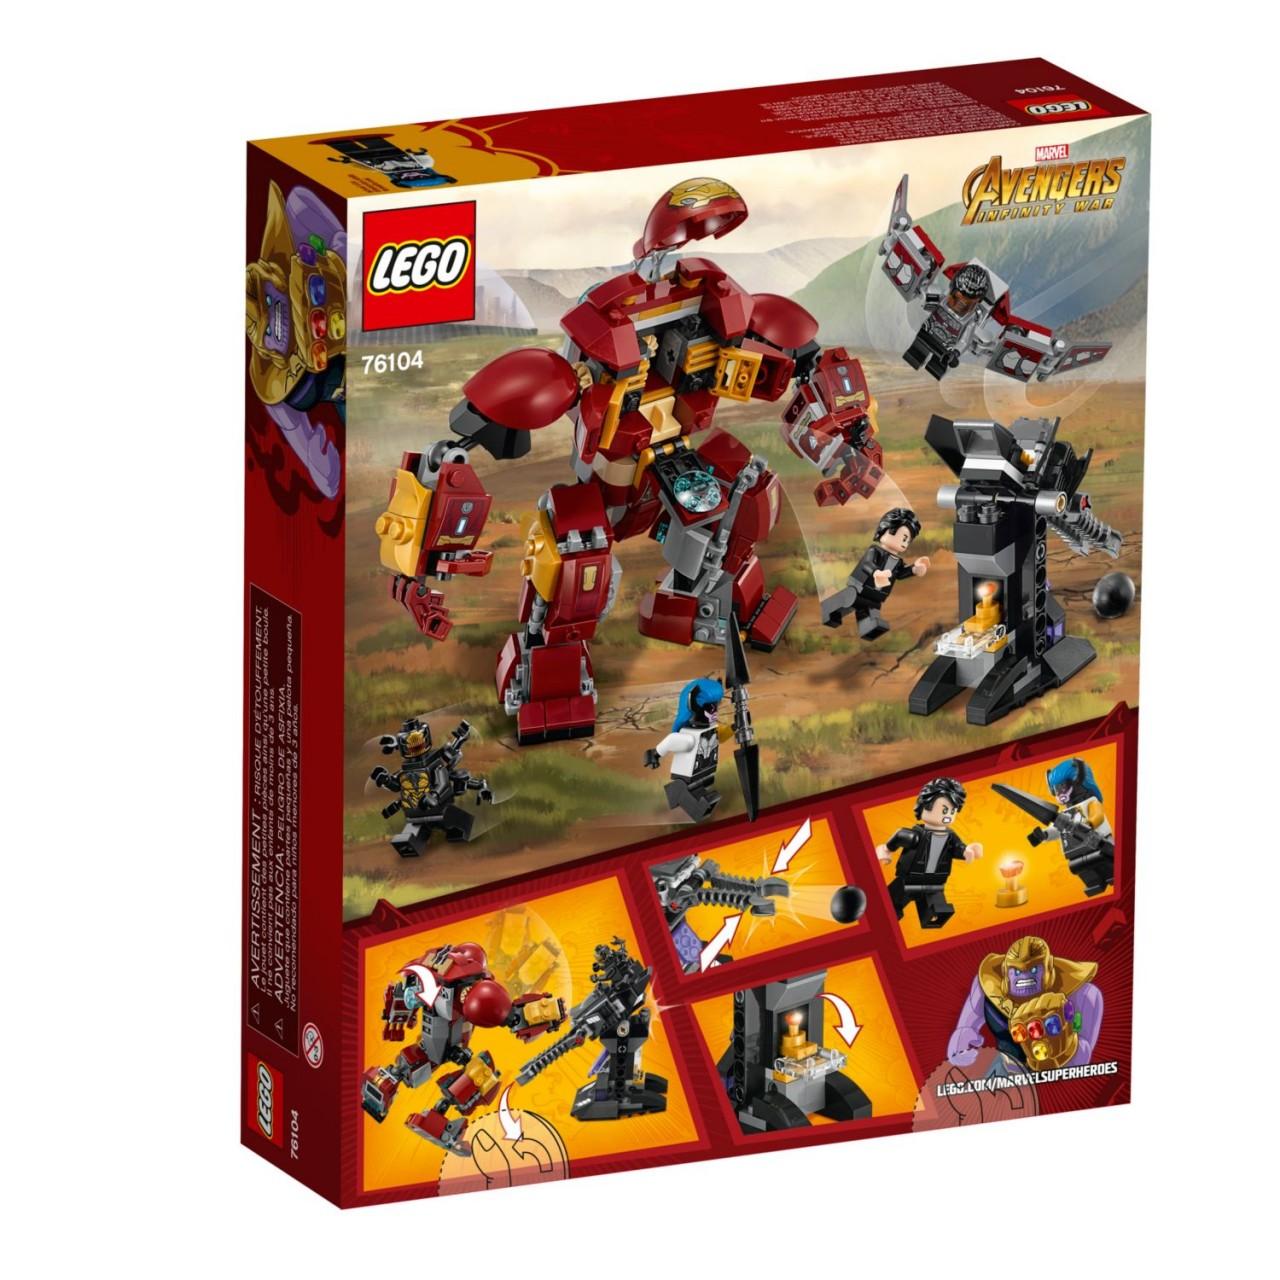 LEGO MARVEL SUPER HEROES 76104 Zerstörung des Hulkbuster